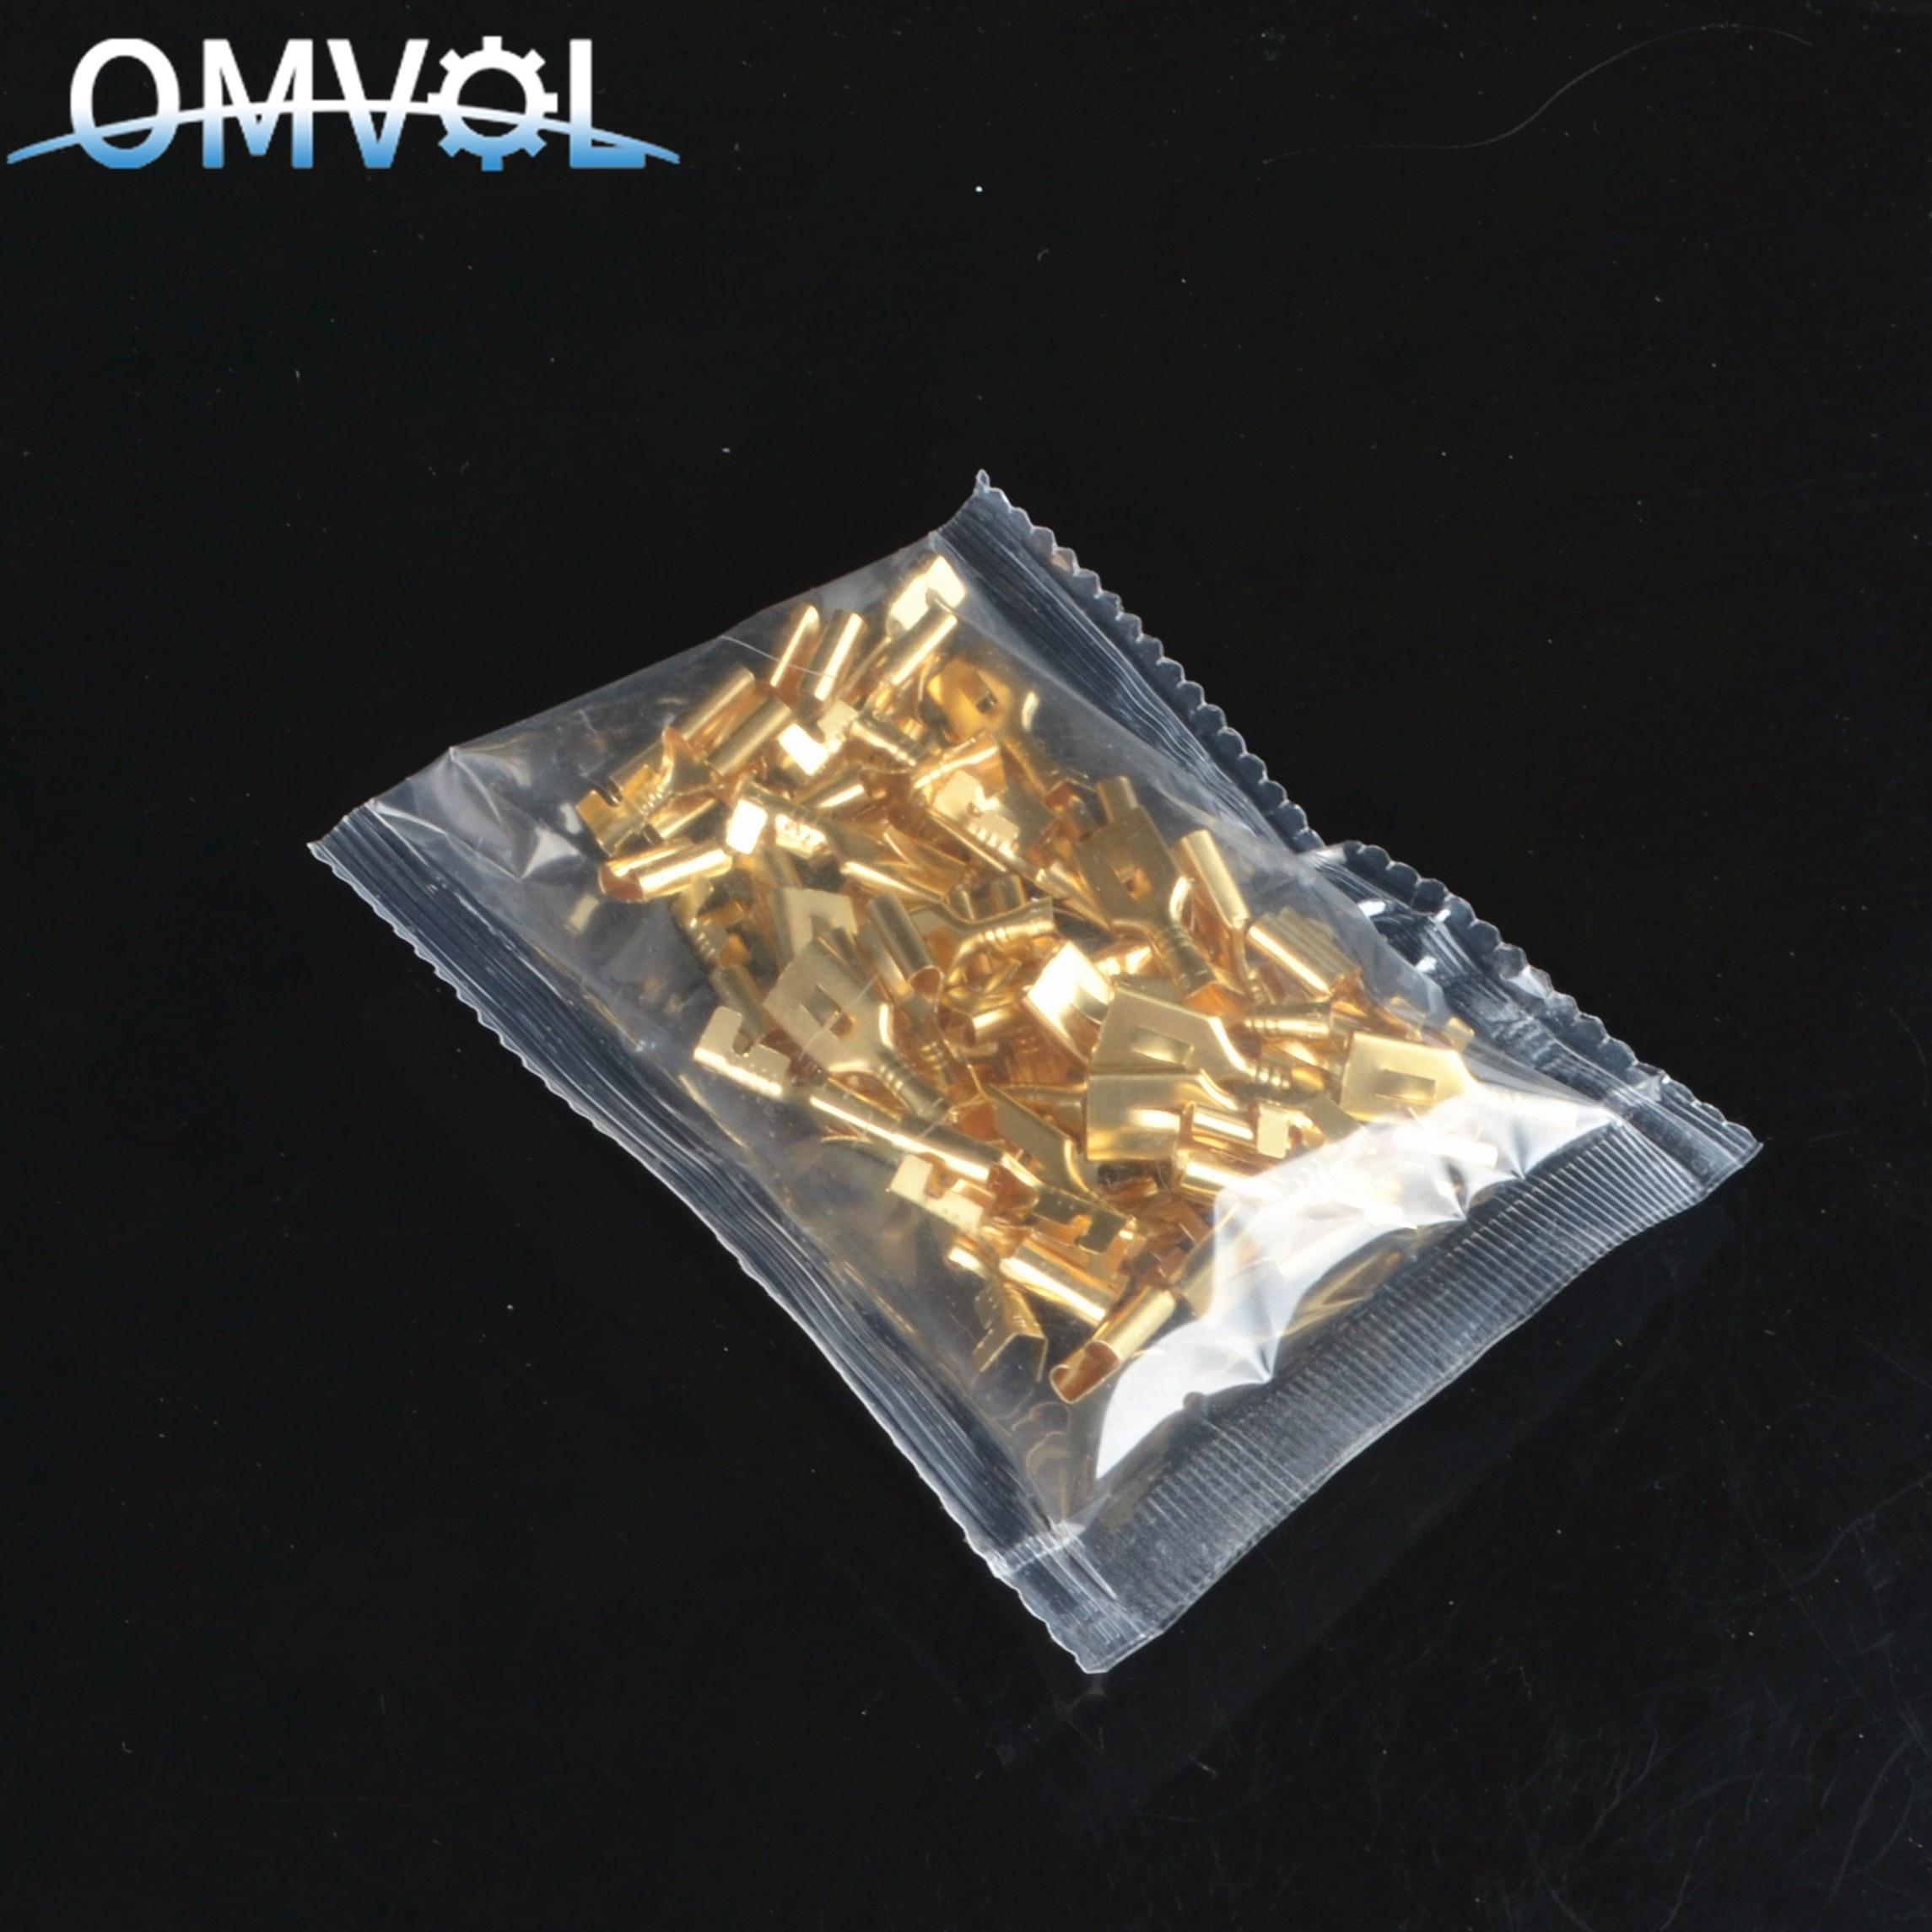 50pcs 6.3mm 6.3 Crimp Terminal Female Spade Connector